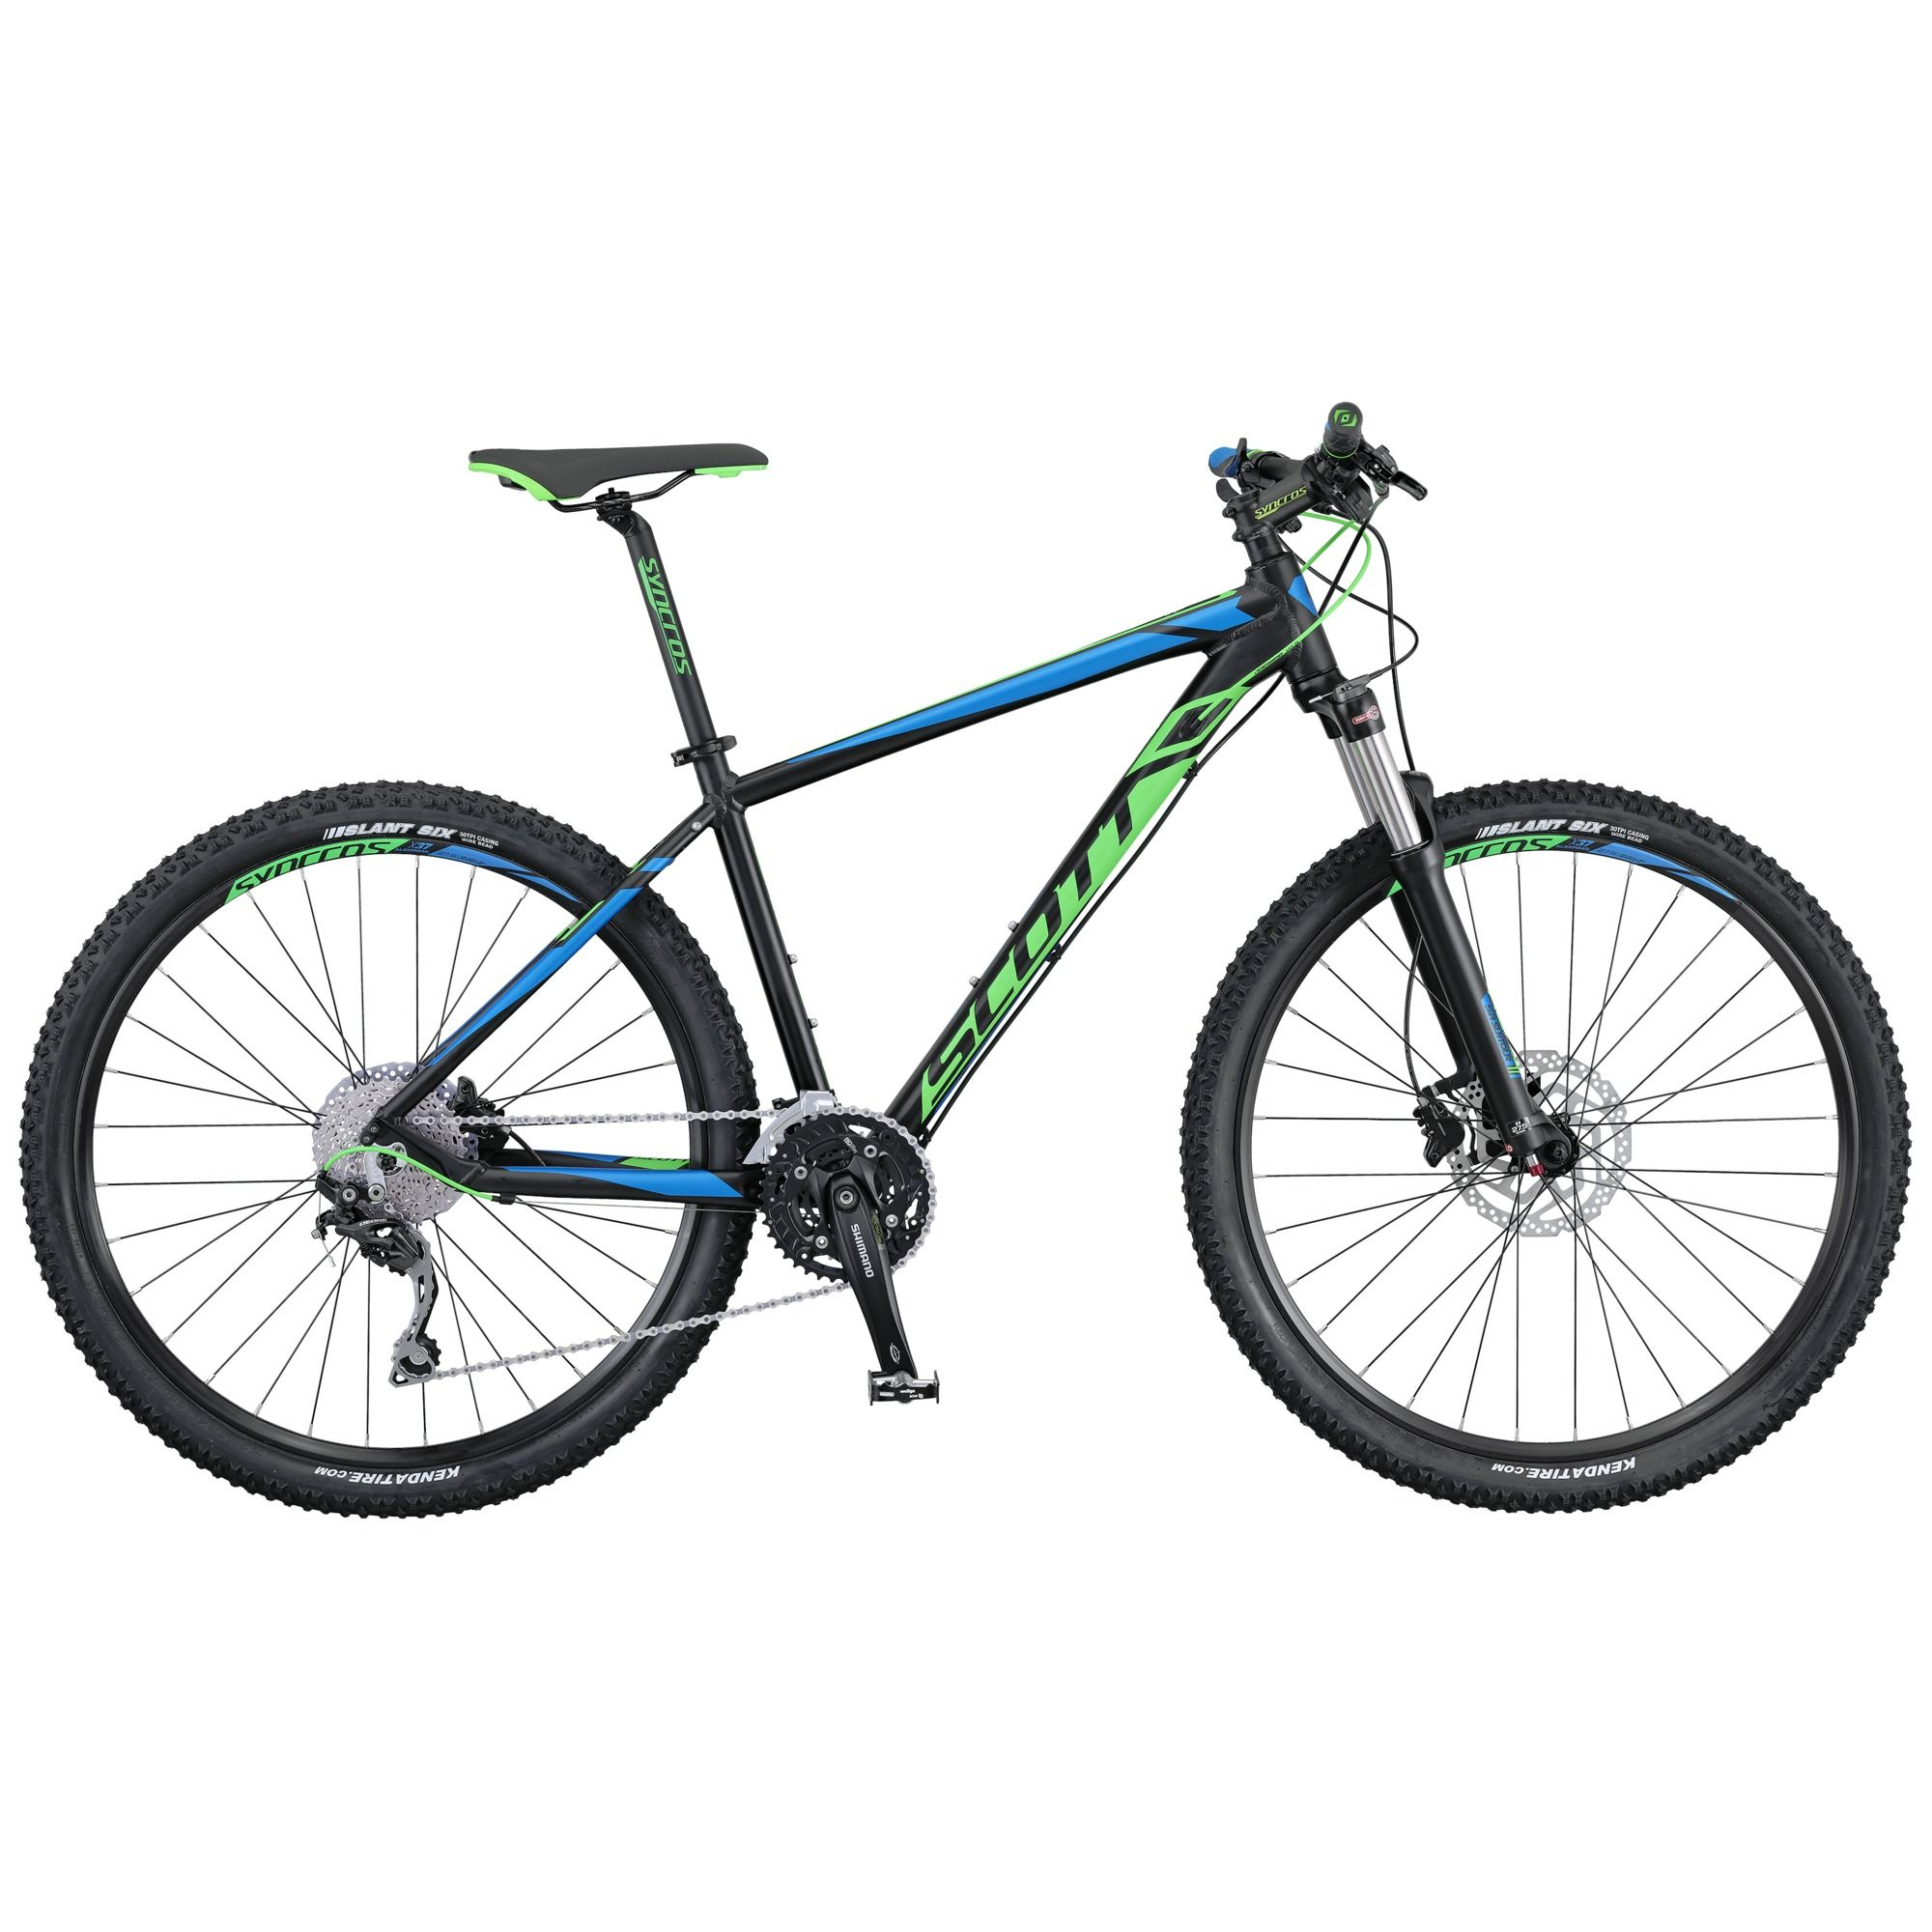 Велосипед ScottГорные<br><br><br>year: 2016<br>цвет: чёрный<br>пол: мужской<br>тип тормозов: дисковый гидравлический<br>диаметр колеса: 27.5<br>тип рамы: хардтейл<br>уровень оборудования: продвинутый<br>материал рамы: алюминий<br>тип амортизированной вилки: воздушно-масляная<br>длина хода вилки: от 100 до 150 мм<br>тип заднего амортизатора: без амортизатора<br>количество скоростей: 30<br>блокировка амортизатора: да<br>рулевая колонка: GW 1SI110 OE integ.<br>вынос: Syncros M3.0, HL-D507A<br>руль: Syncros M3.0, ширина 720 мм, подъем 12 мм, 31.8 мм, 9°<br>передний тормоз: Shimano BR-M396, SM-RT20 CL Rotor, диаметр ротора 180 мм<br>задний тормоз: Shimano BR-M396, SM-RT20 CL Rotor, диаметр ротора 160 мм<br>тормозные ручки: Shimano BL-M396<br>цепь: KMC X10<br>система: Shimano FC-M523, 40x30x22T<br>каретка: Shimano BB-ES-300, Cartridge Type<br>педали: Wellgo M-248DU<br>ободья: Syncros X-37 Disc, 32H<br>передняя втулка: Formula CL51<br>задняя втулка: Shimano FH-RM 35-CL<br>спицы: 14 G, stainless<br>передняя покрышка: Kenda Slant 6, 30TPI, 27.5 x 2.1<br>задняя покрышка: Kenda Slant 6, 30TPI, 27.5 x 2.1<br>седло: Syncros M2.5<br>подседельный штырь: Syncros M3.0, 27.2mm<br>кассета: Shimano CS-HG50-10, 11-36T<br>передний переключатель: Shimano Deore FD-M610 / 31.8mm<br>задний переключатель: Shimano Deore RD-M610 SGS, Shadow Type, 30 Speed<br>манетки: Shimano Deore SL-M610, Rapidfire plus, 2 way release w/gear indicator<br>вес: 14 кг<br>рама: Aspect 700 series, Alloy 6061 Performance geometry, Internal cable routing<br>вилка: Suntour XCR-RL-R 27.5, Remote Lockout, reb. Adj, ход 100 мм<br>размер рамы: 20&amp;amp;quot;<br>Серия: Aspect